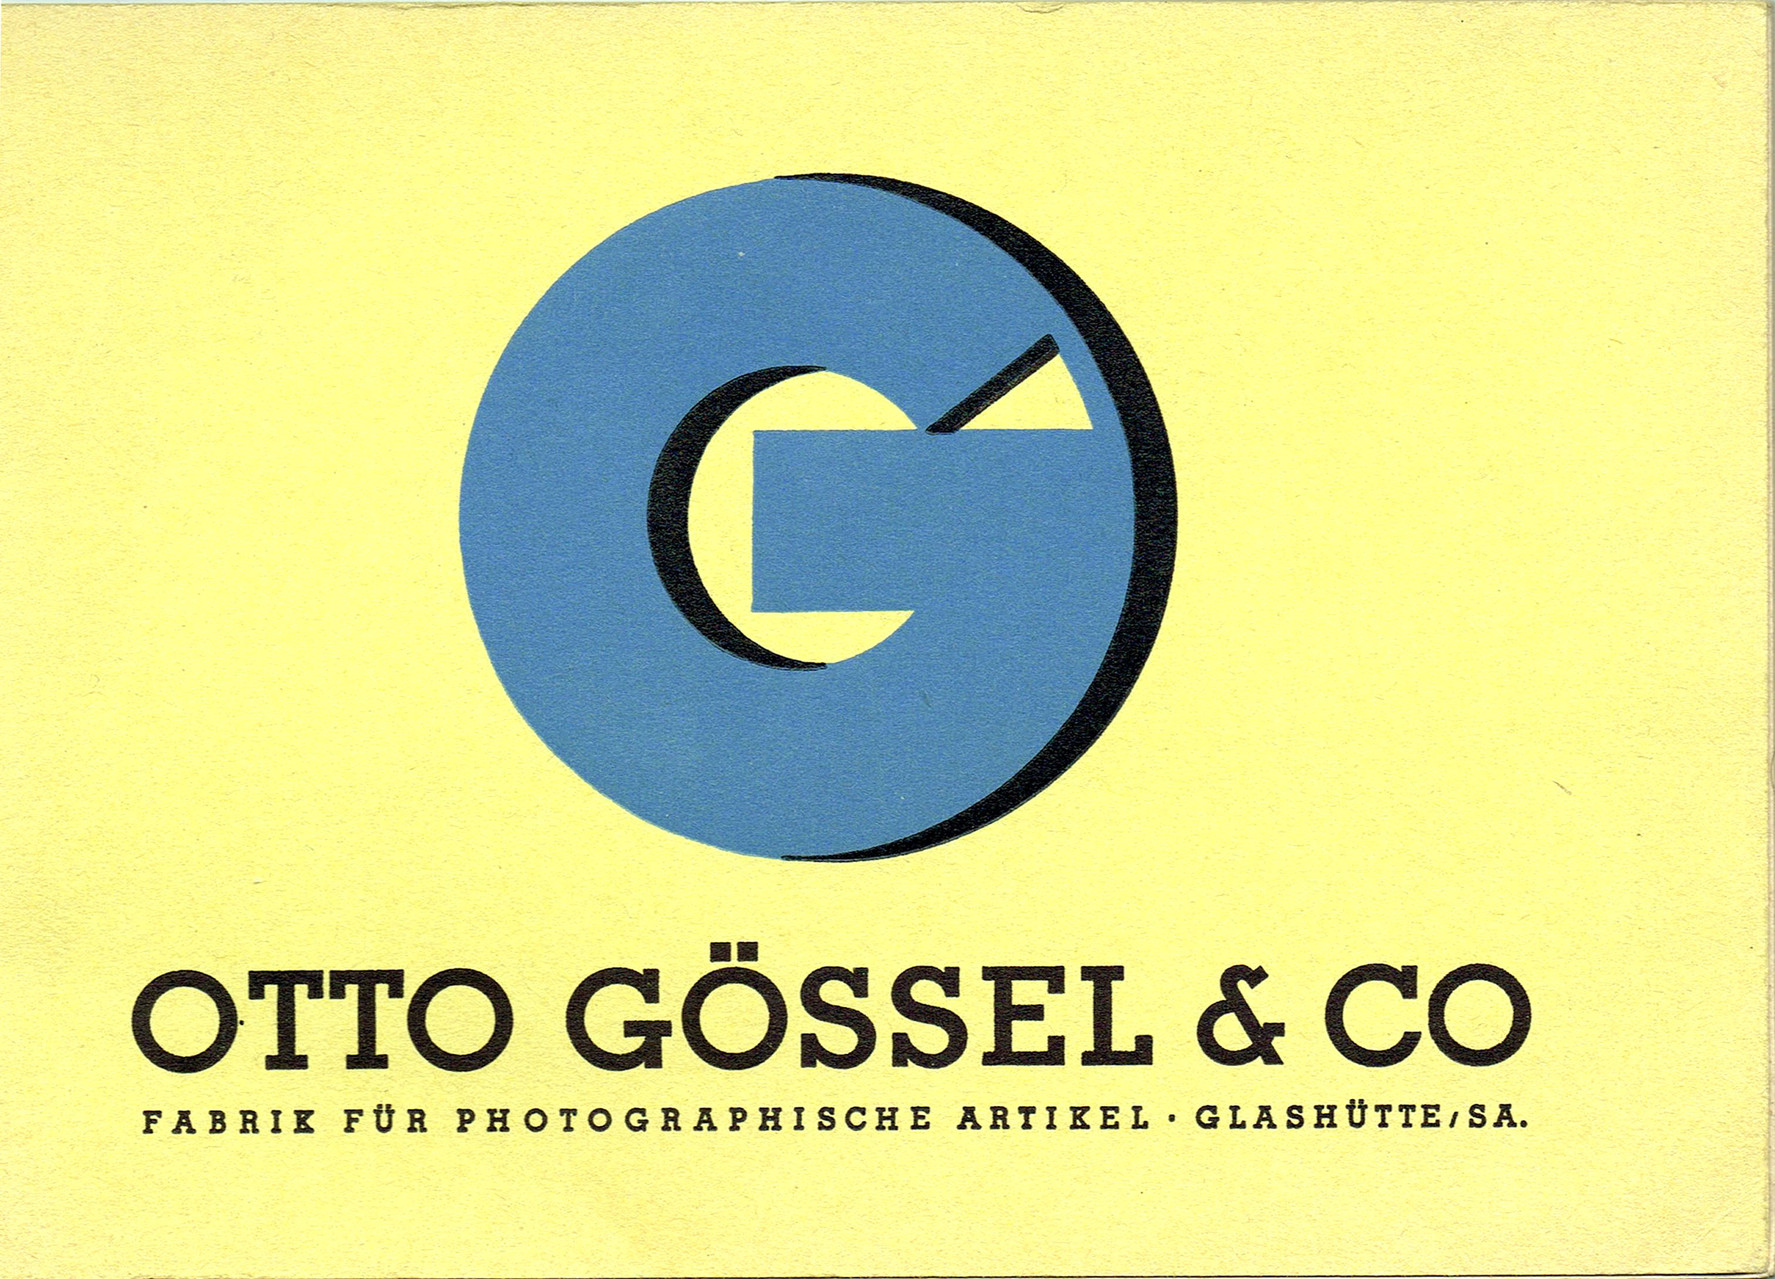 Feinmechanische Fabrik Otto Gössel & Co. 1918 - 1934 ...